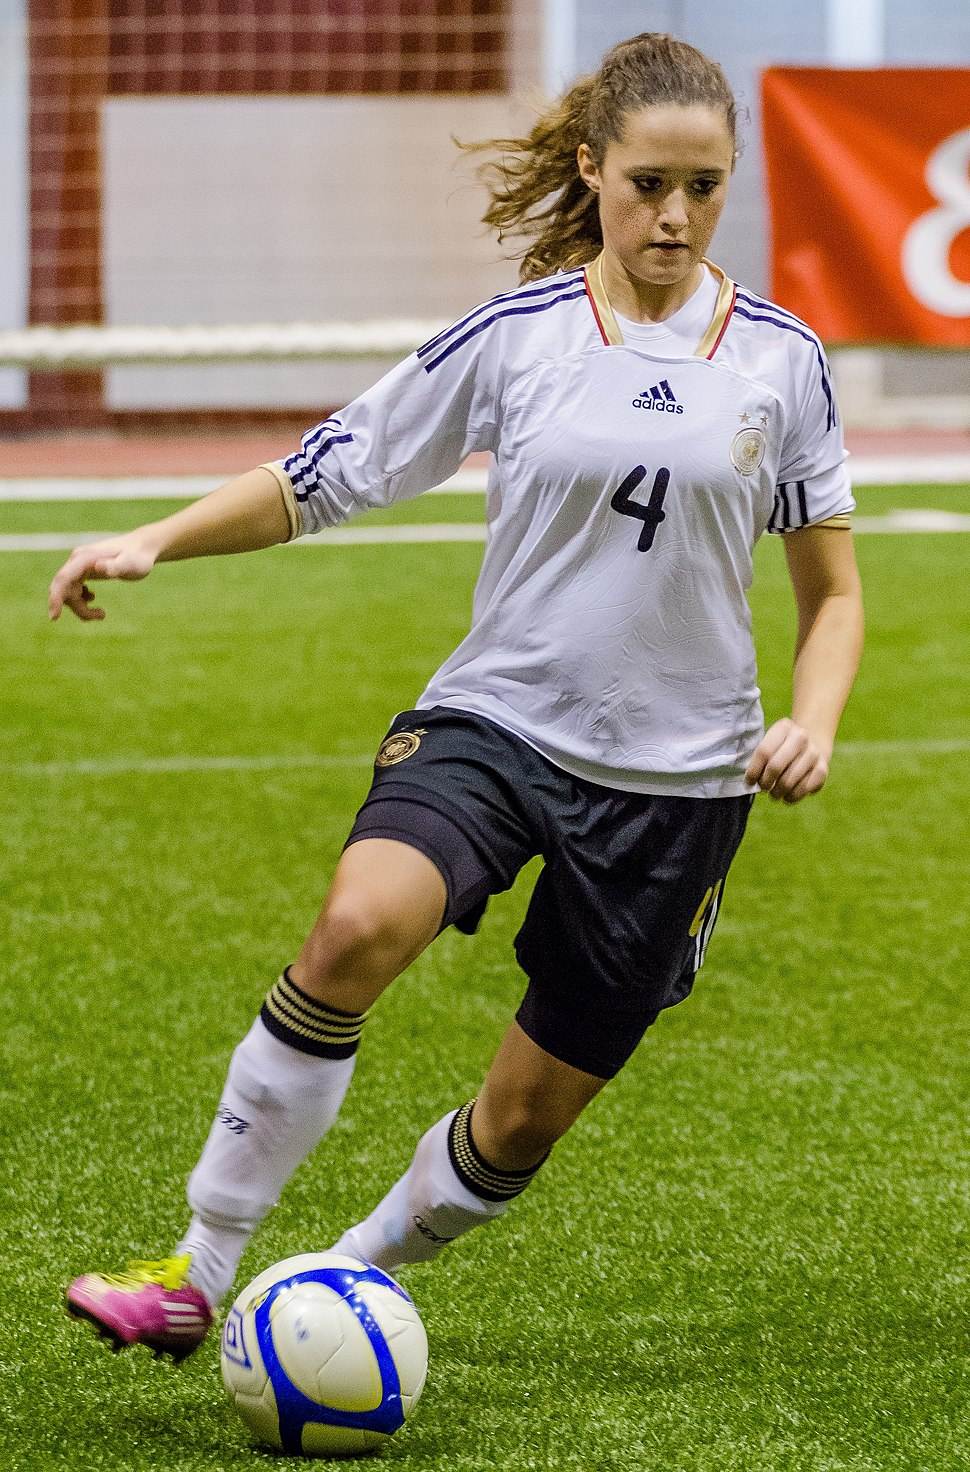 Jaser Franziska 121121 f18 Sverige-Tyskland 0-4 3460